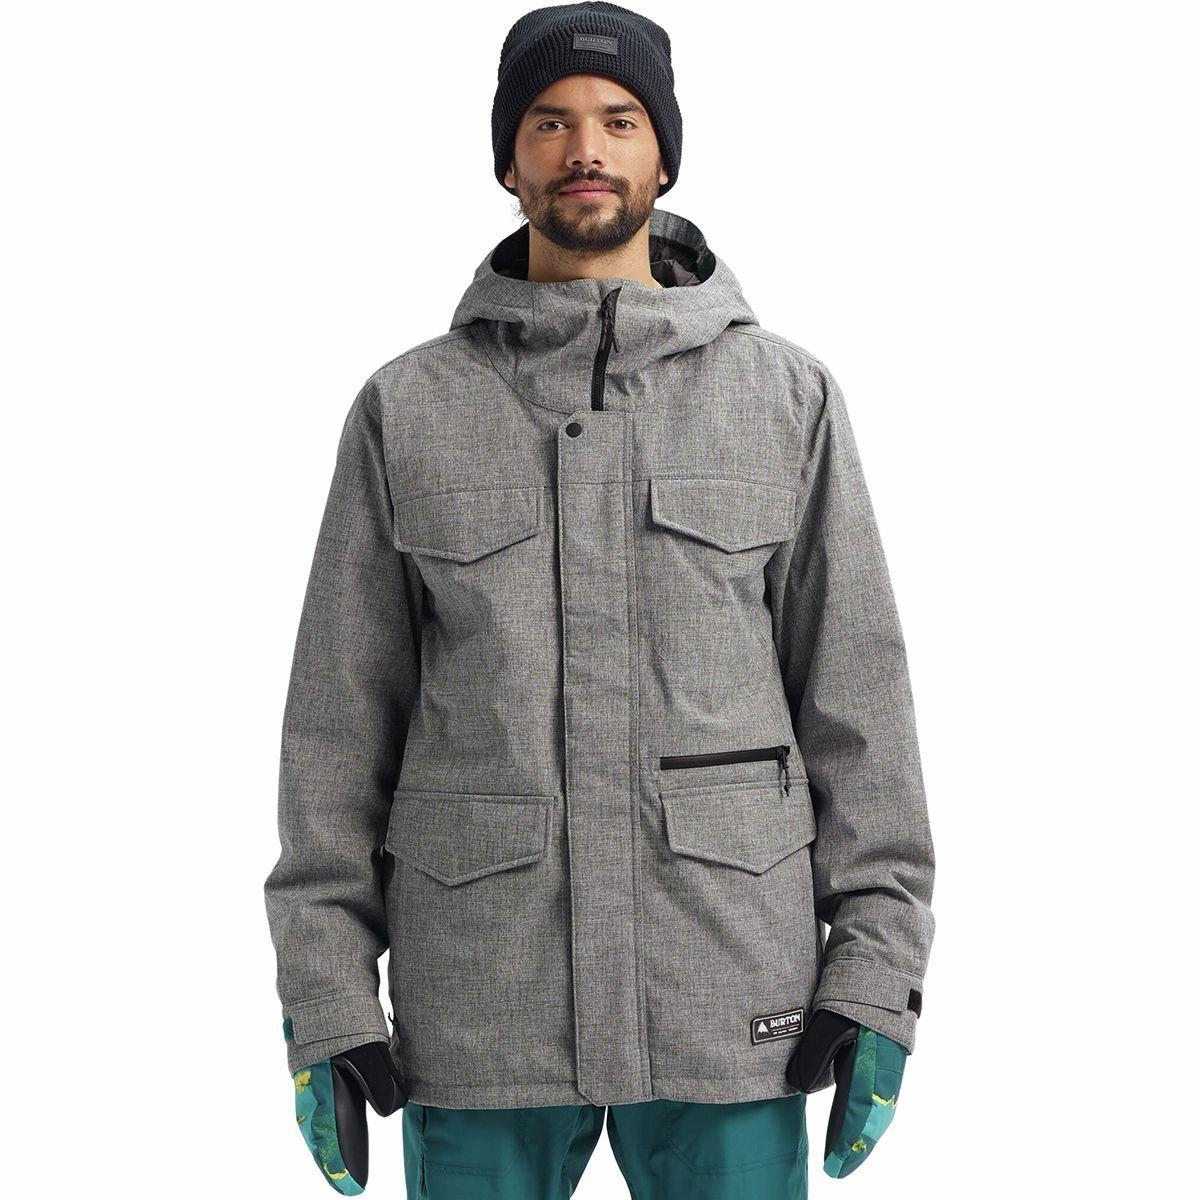 Covert Insulated Jacket - Men